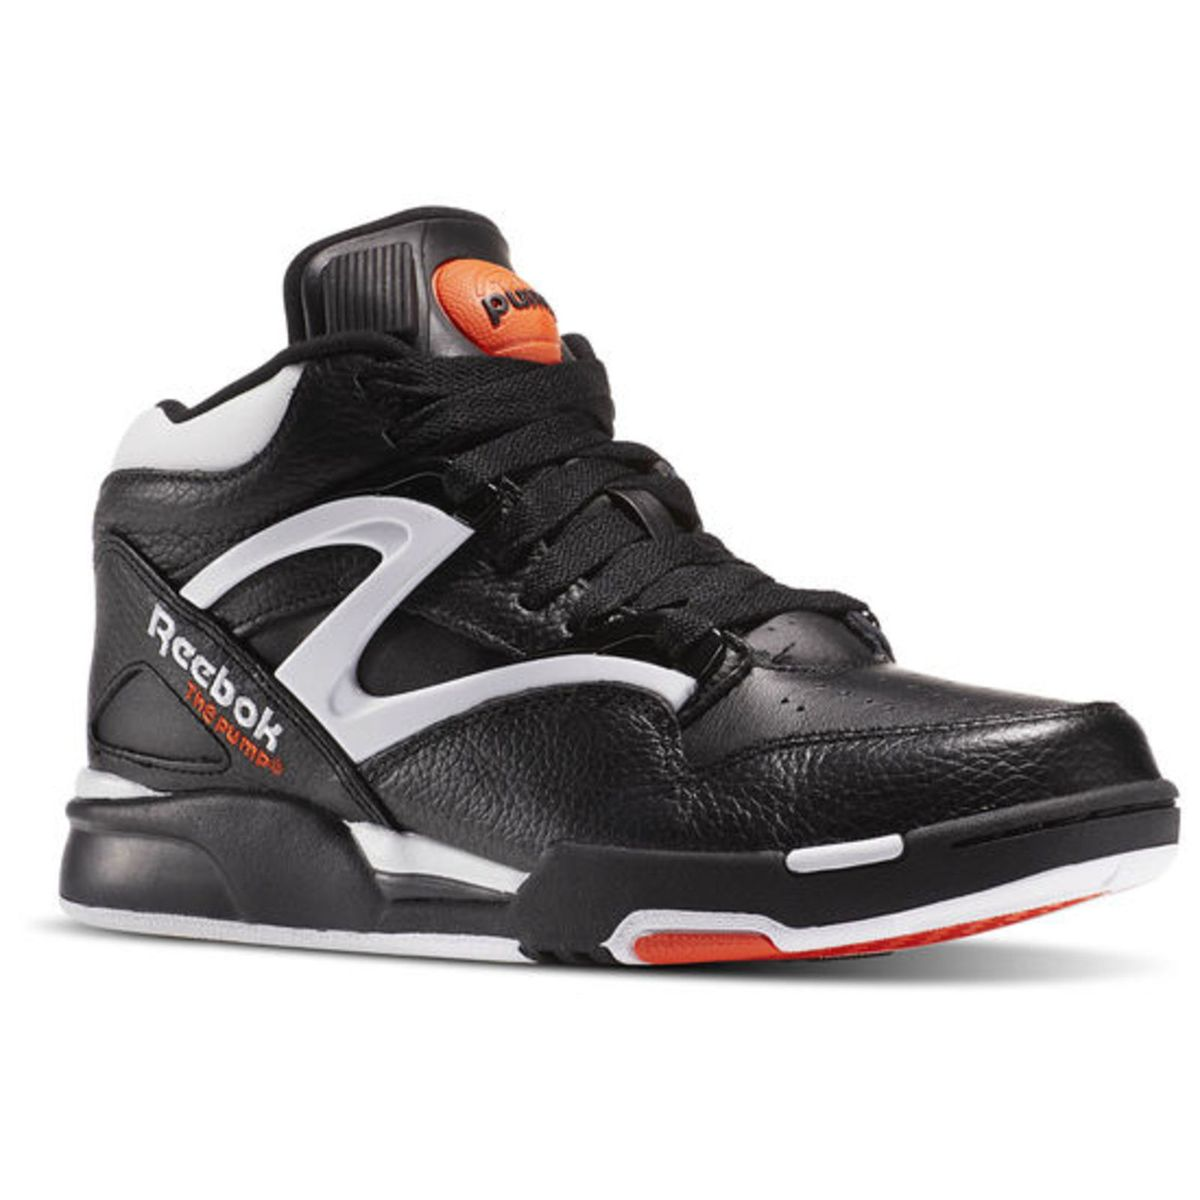 c9a27a793f Tênis Reebok Pump Omni Lite - Sneaker - Dee Brown Nba | Tênis Masculino  Reebok Nunca Usado 24420170 | enjoei